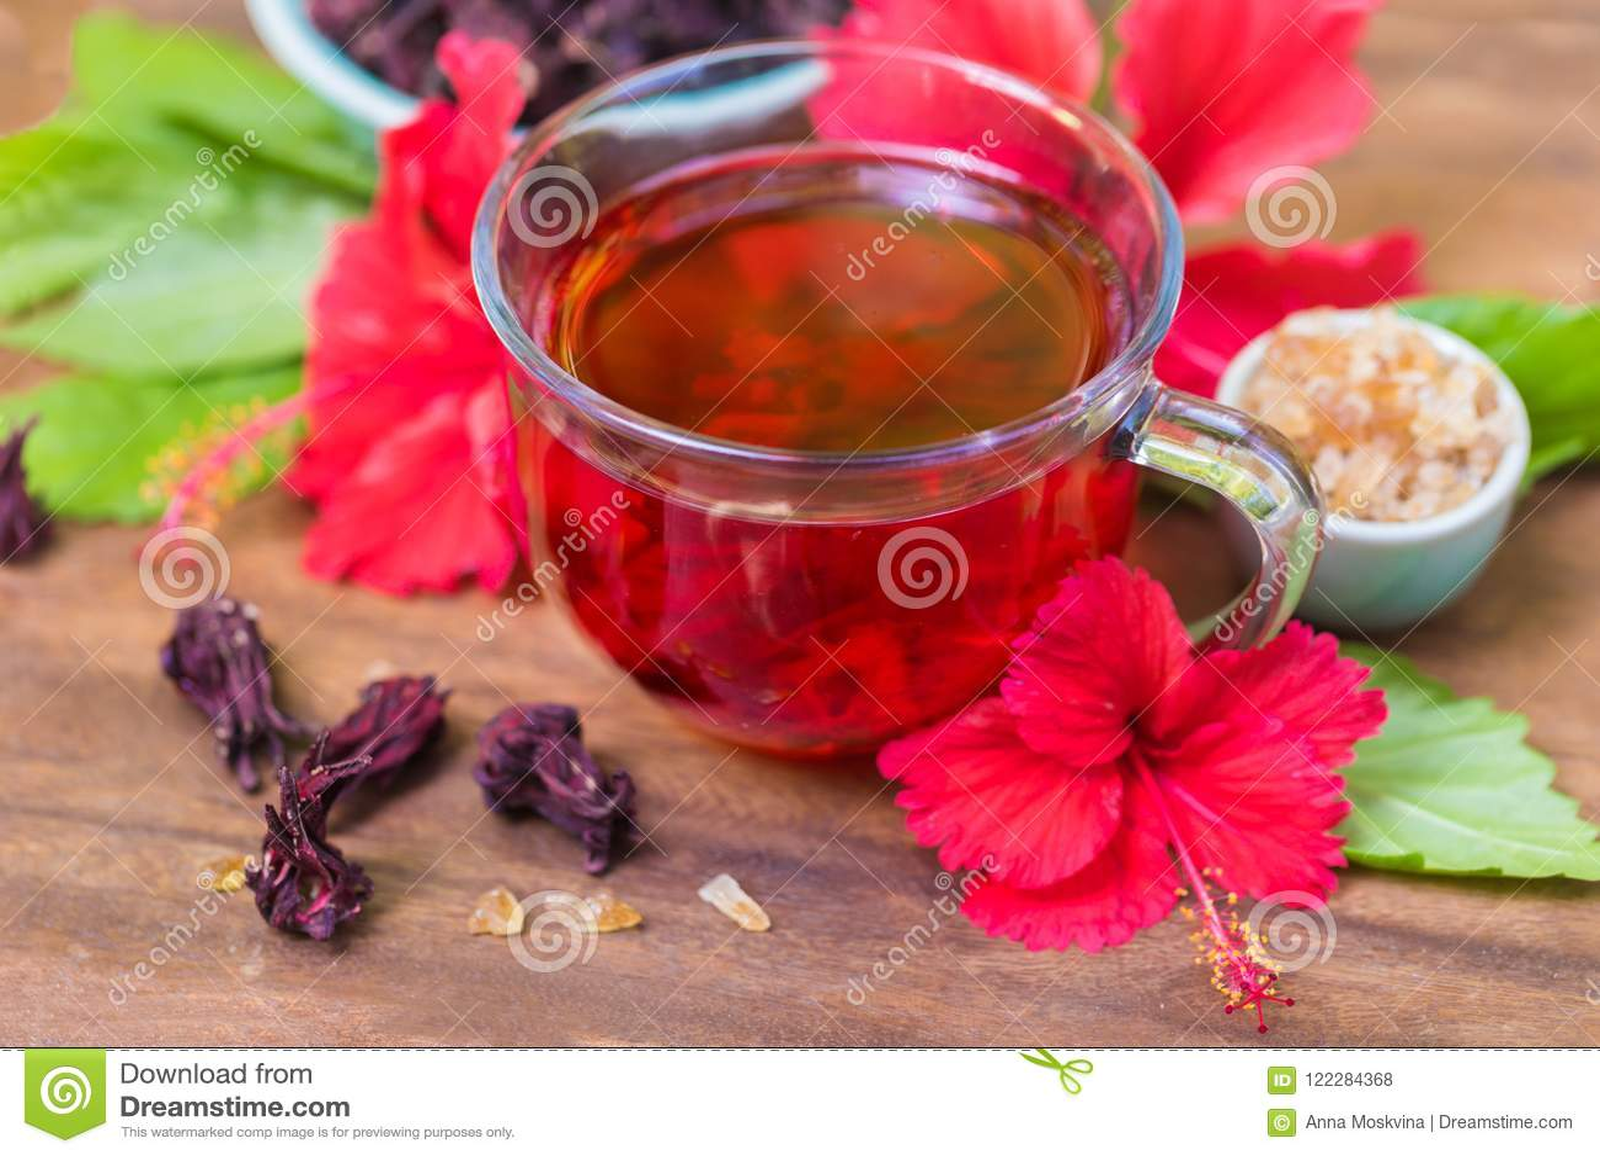 Red Karkade Hibiscus Red Sorrel Tea In Glass Mug Roselle Flowers